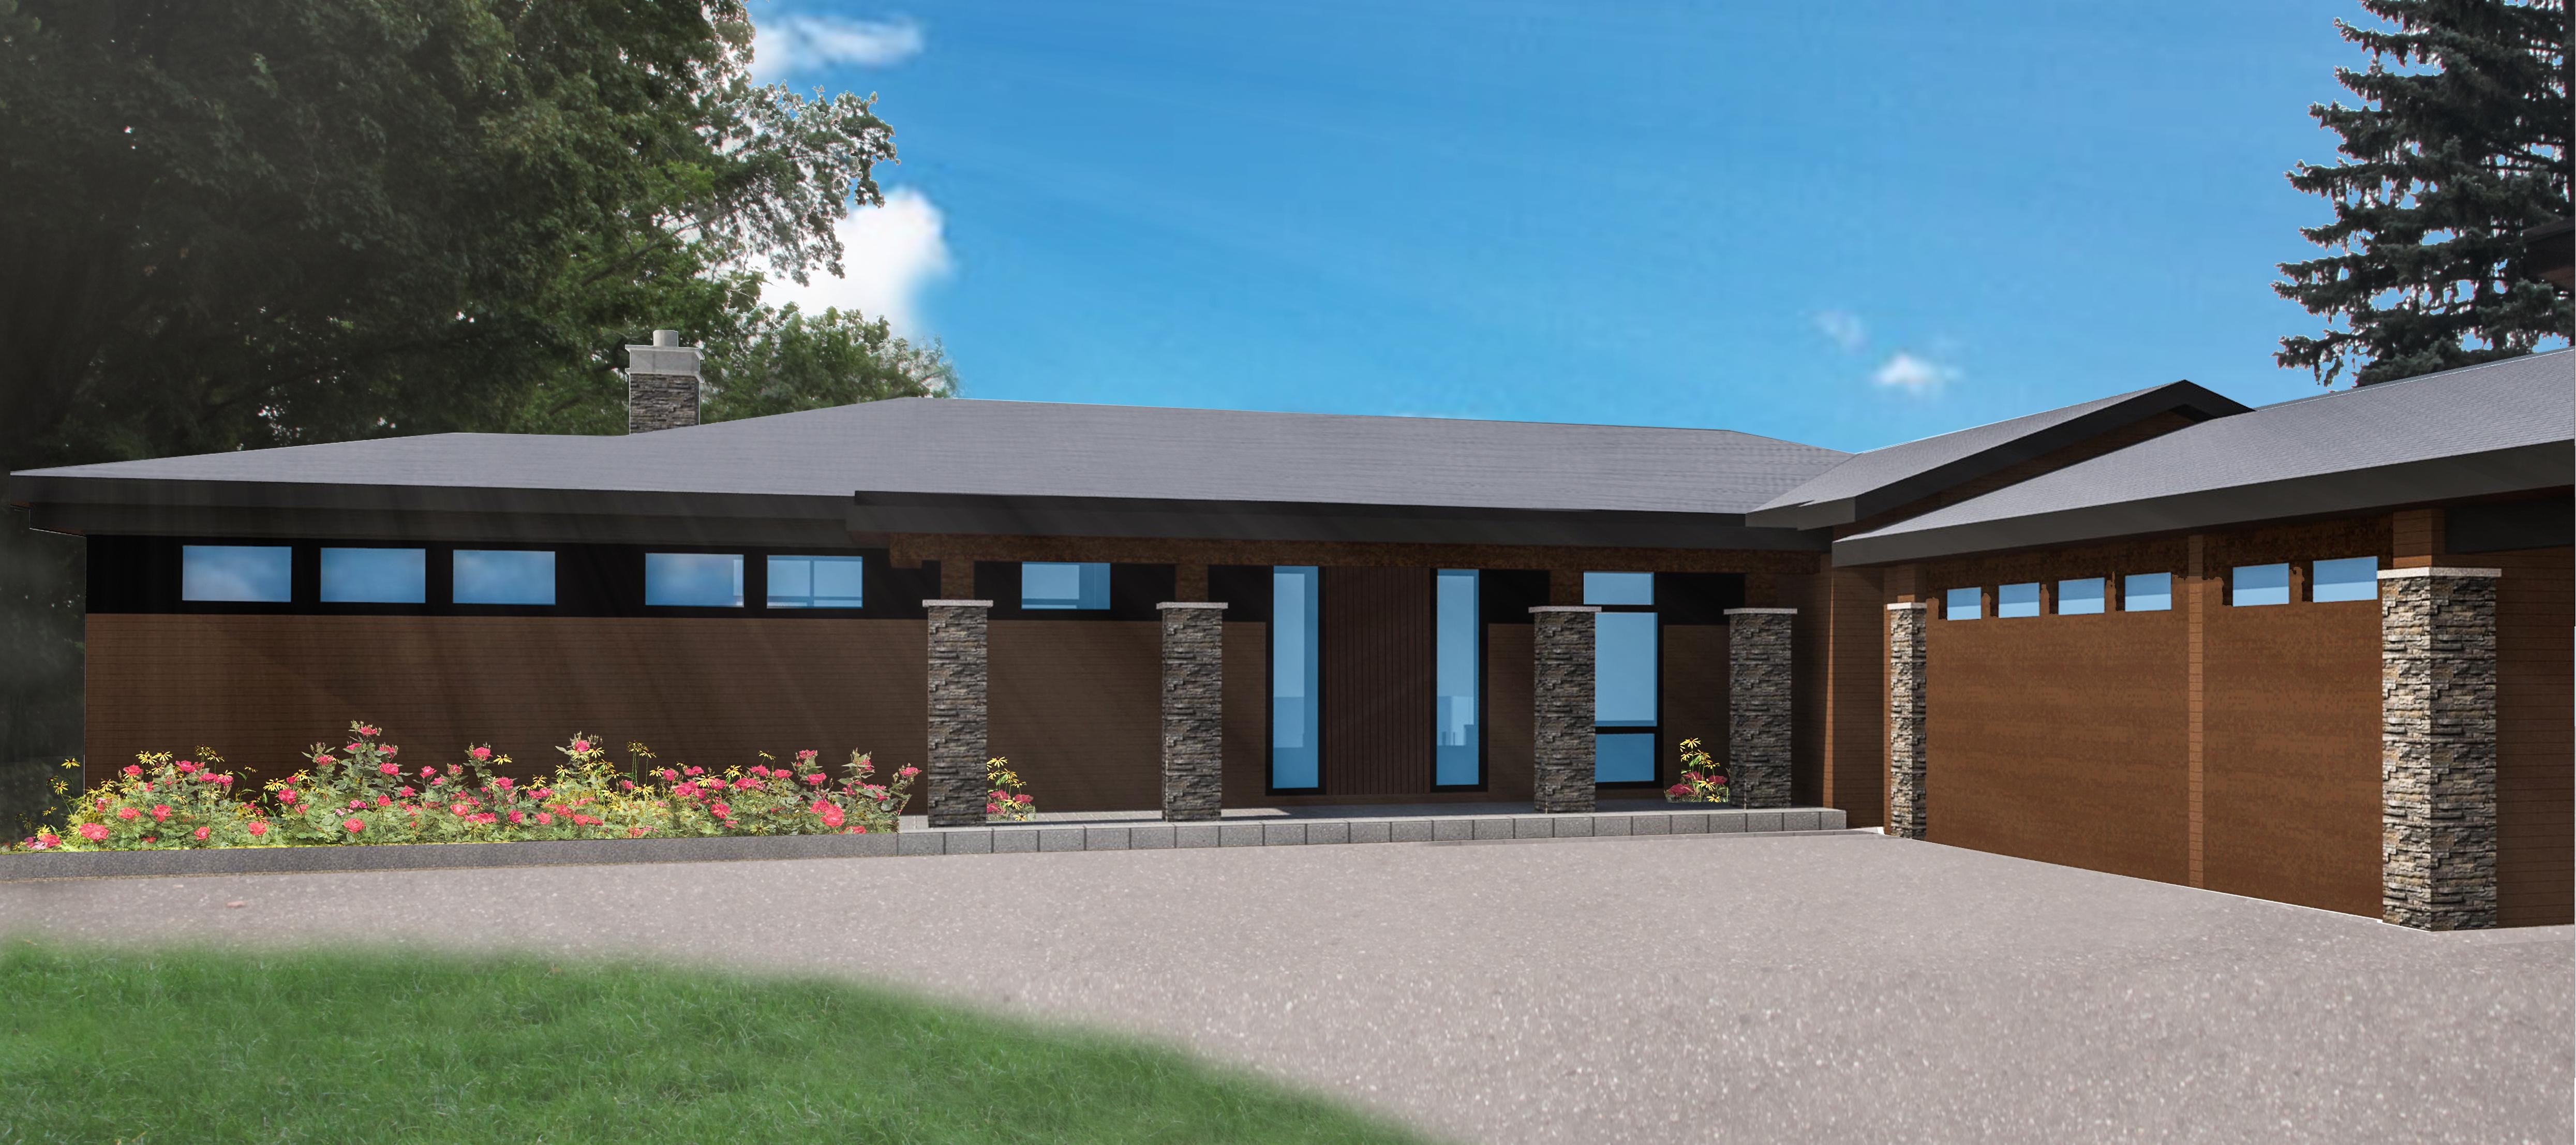 Midland Bay Cottage Rendering 1